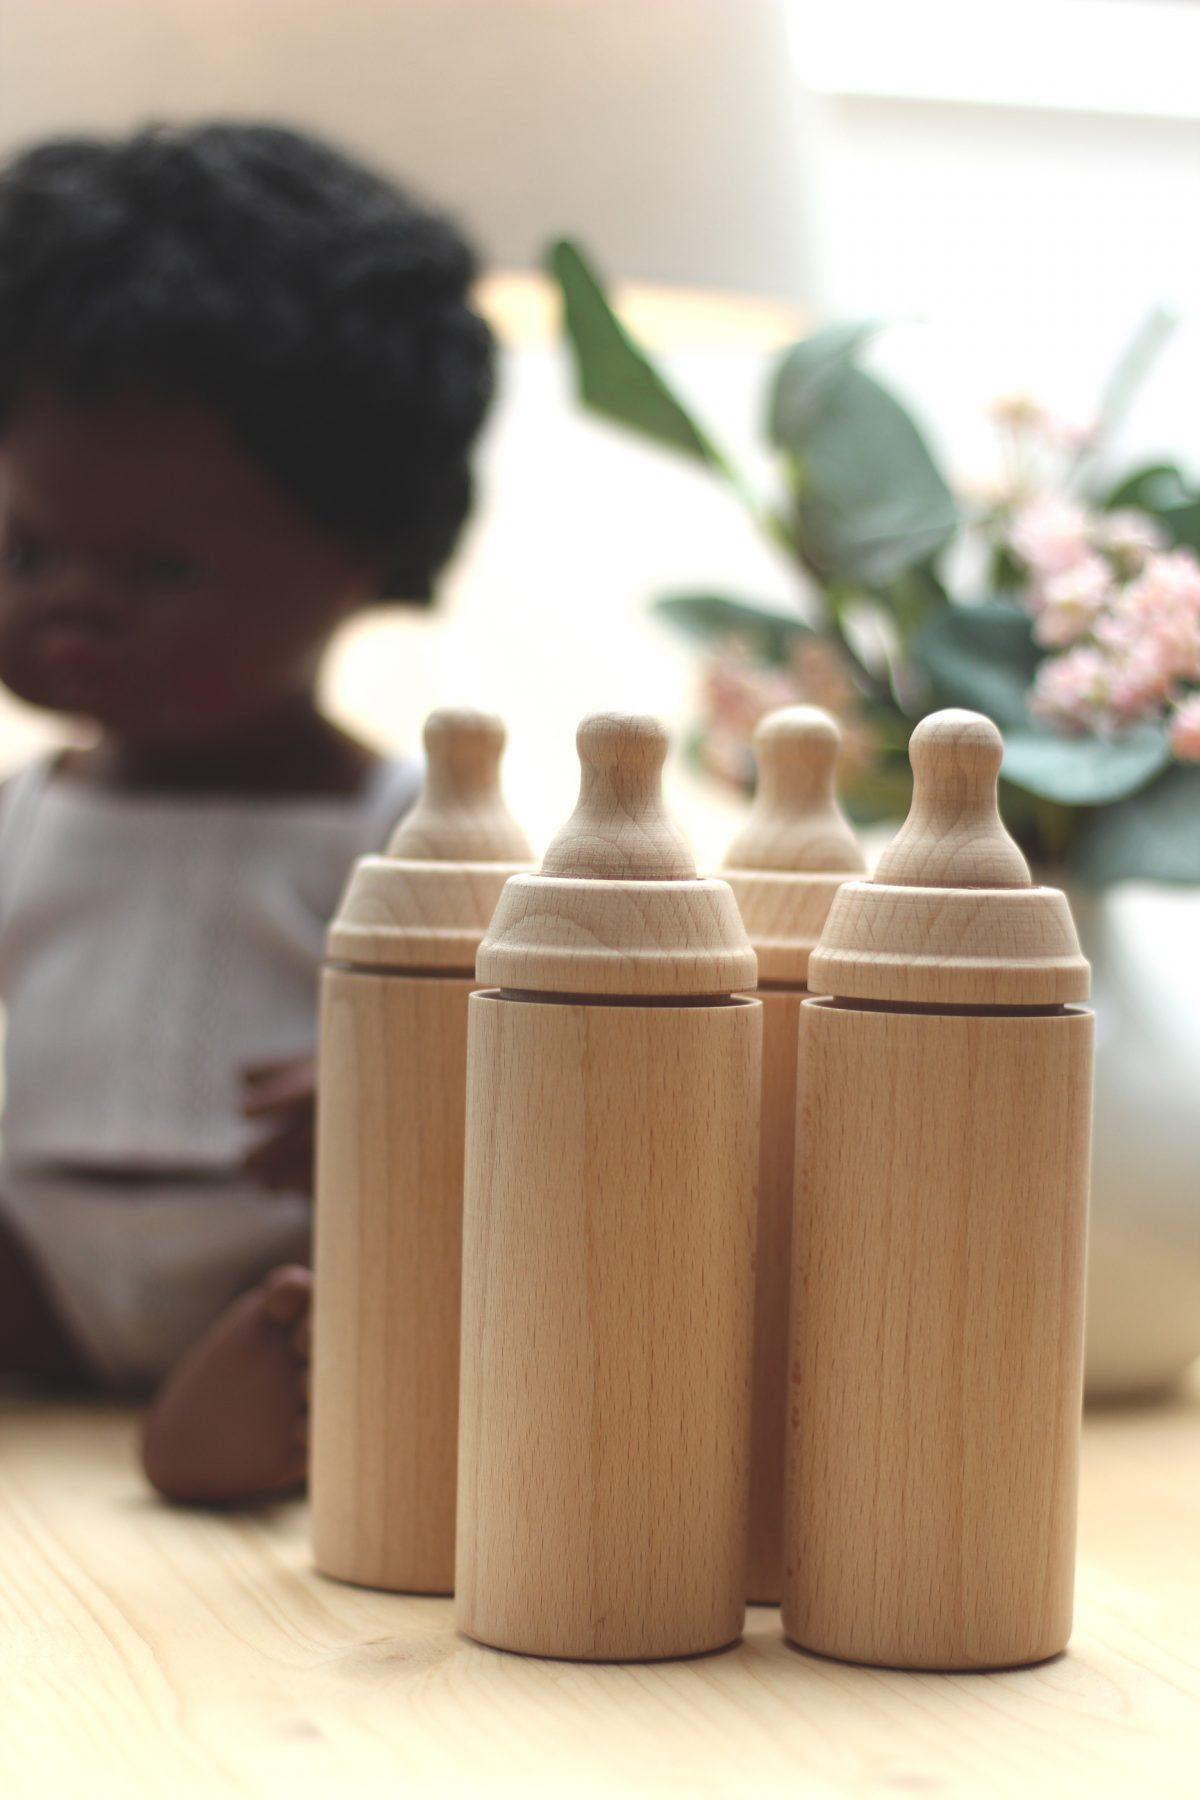 MINILAND butelka drewniana Naturalna chwalipietka